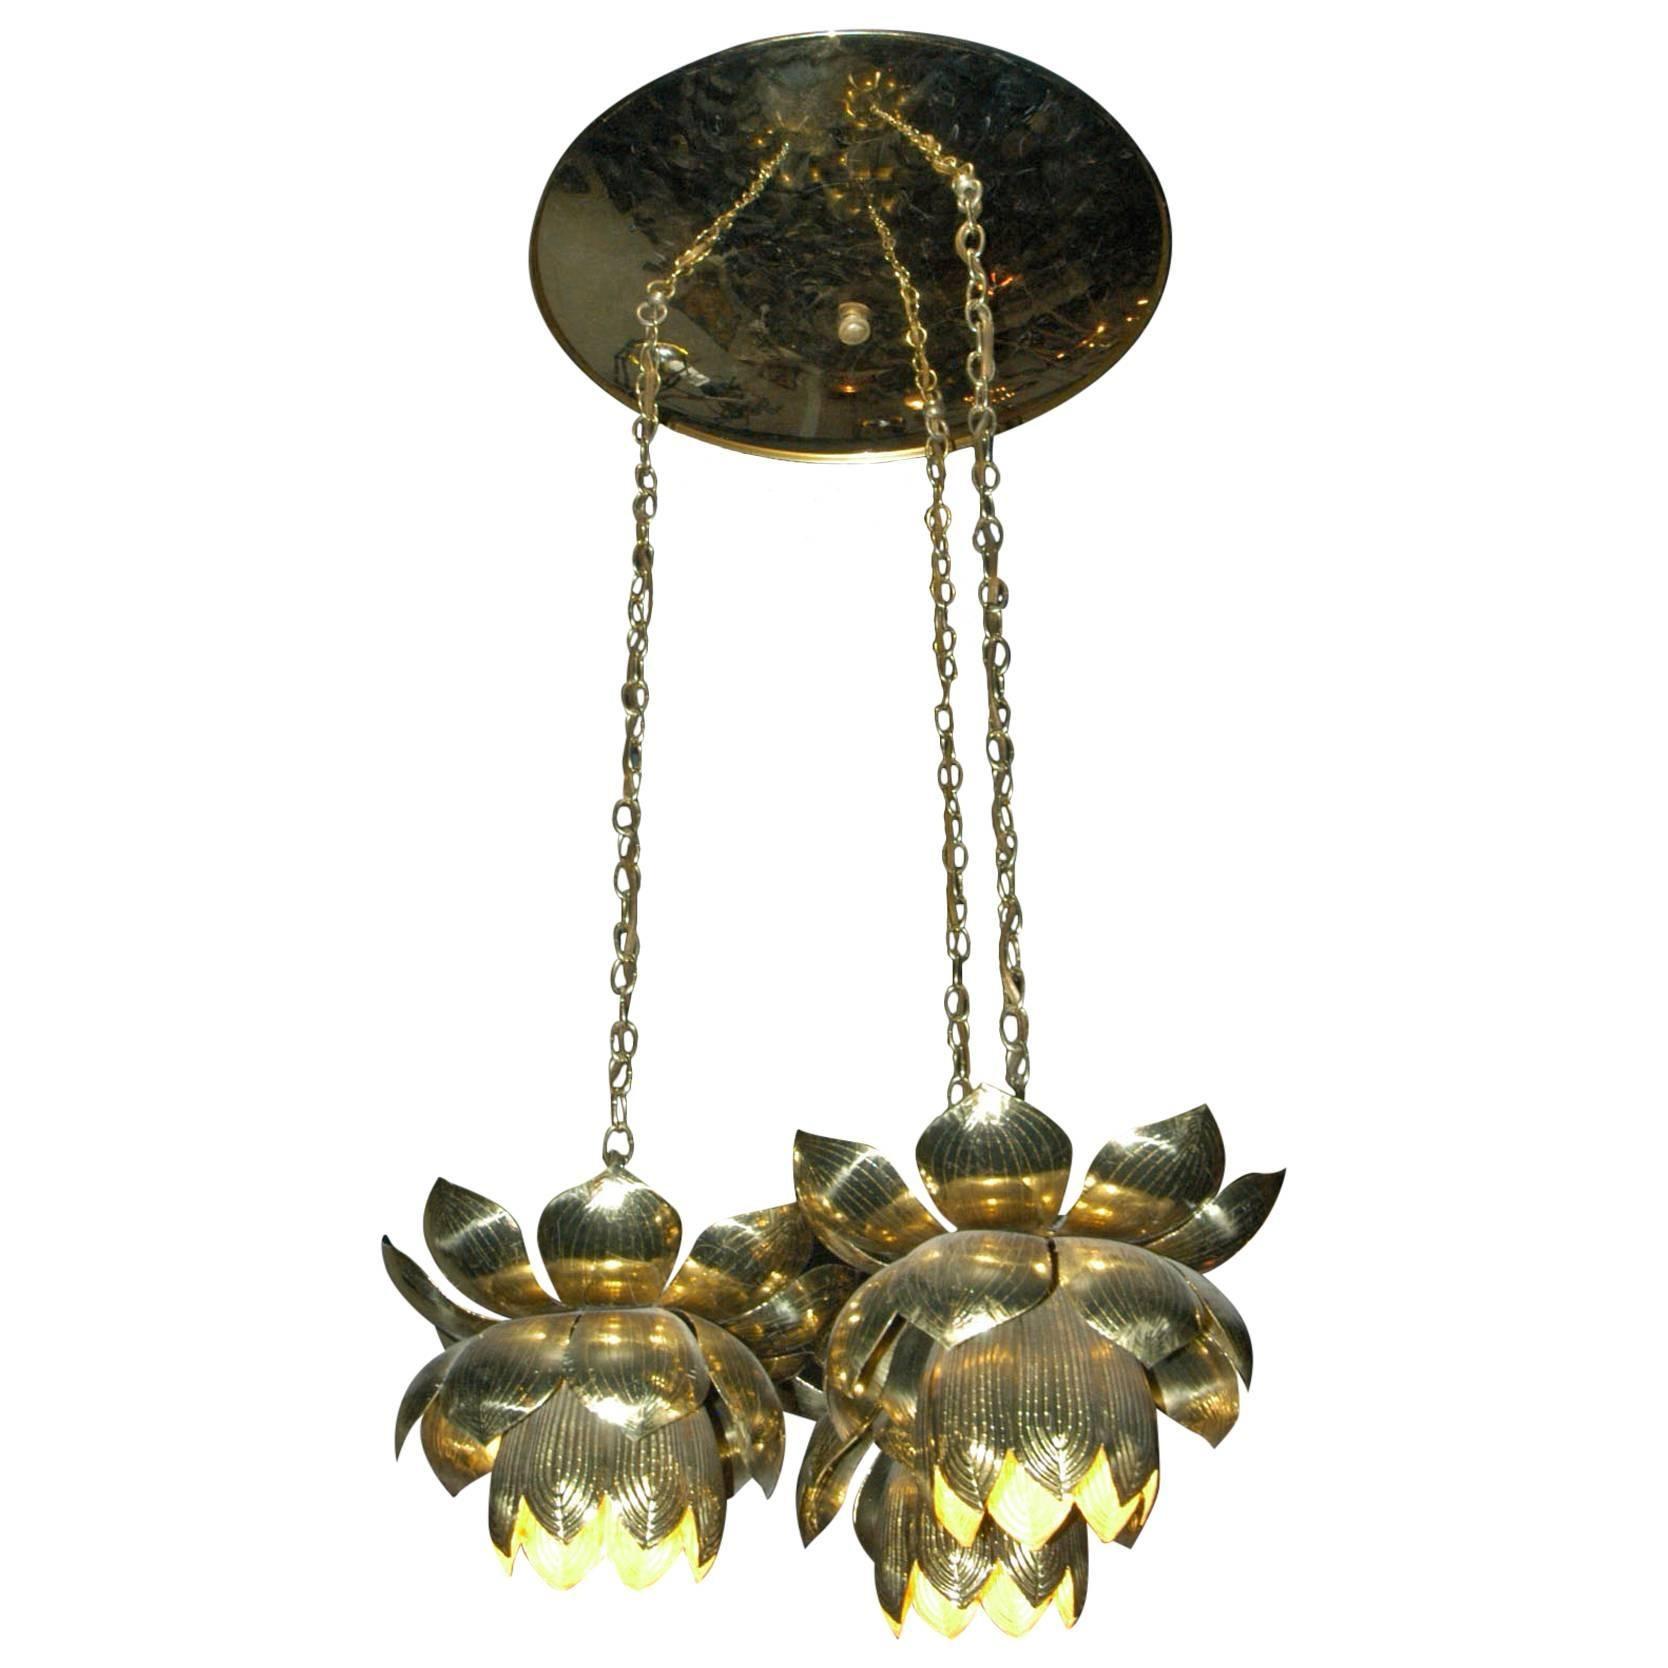 Feldman Lighting Co. Mid-Century Lotus Pendant Chandelier